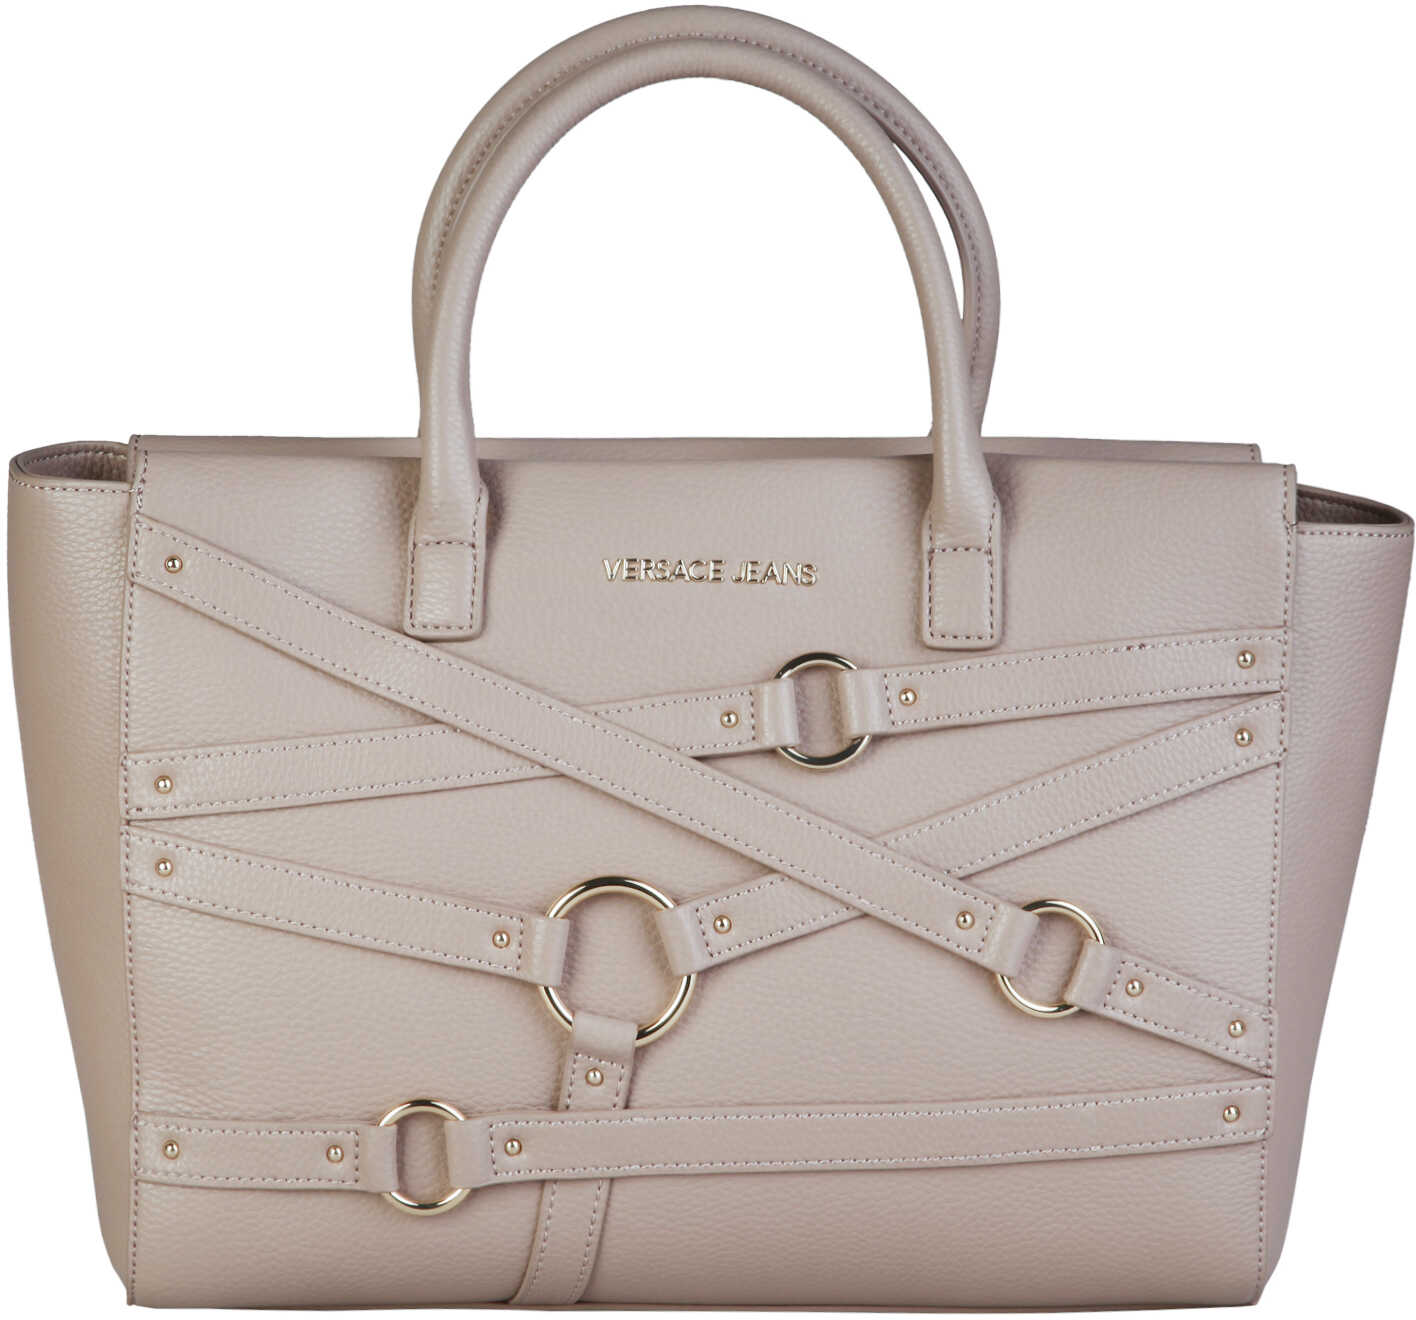 Versace Jeans E1vpbbb1_75586* Pink